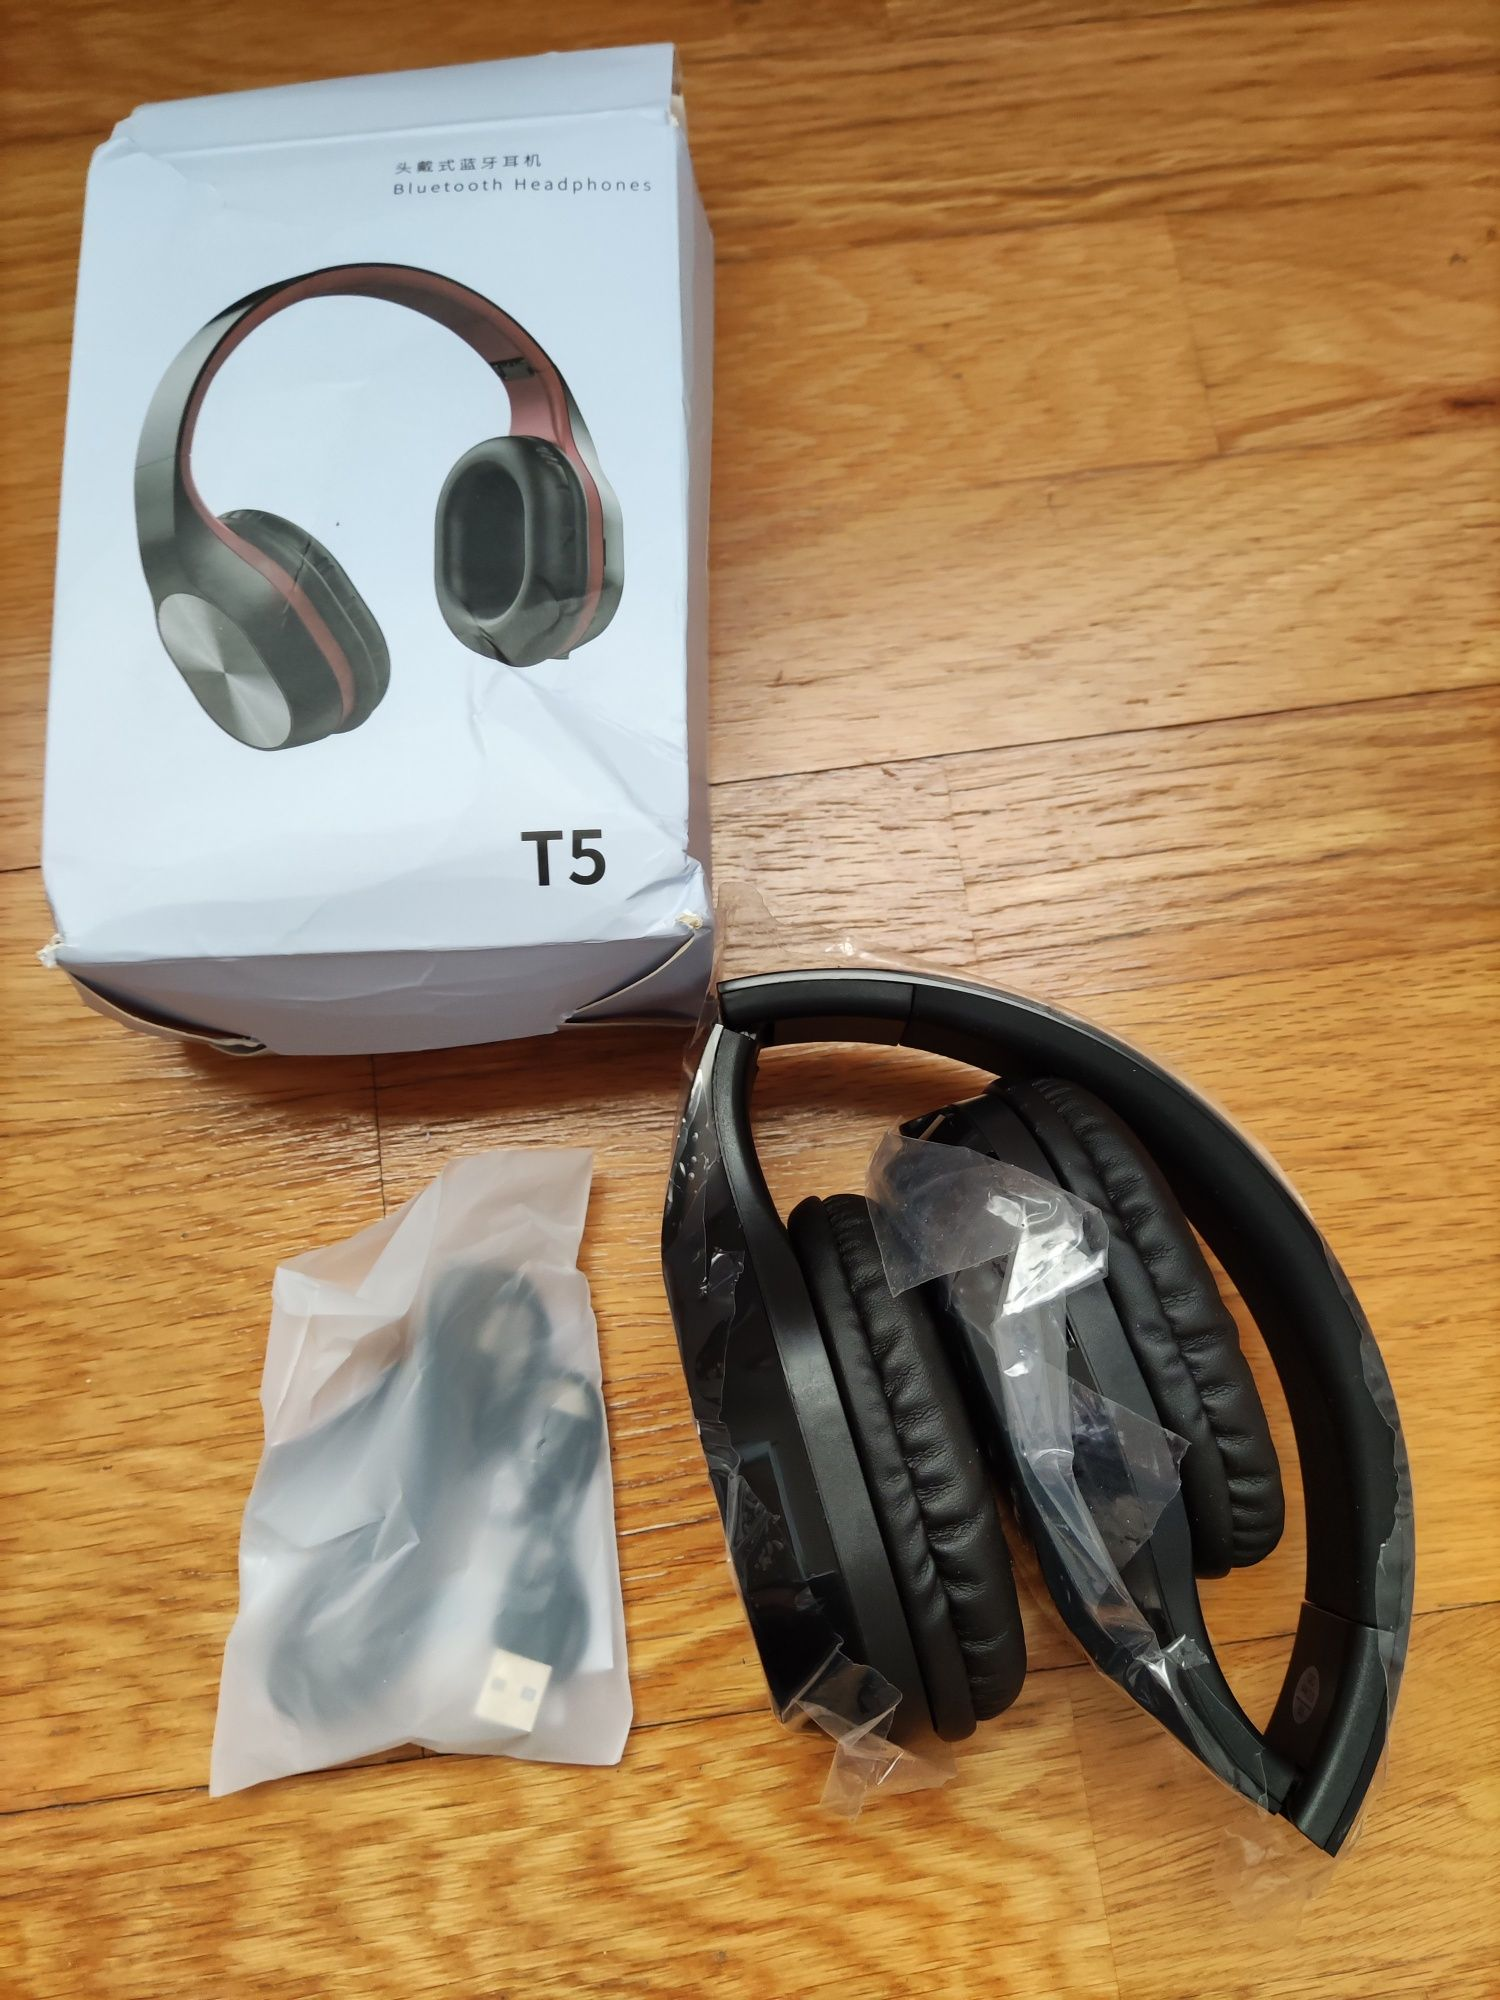 Auscultadores Wifi Bluetooh 5.0 Surround com microfone Headphones